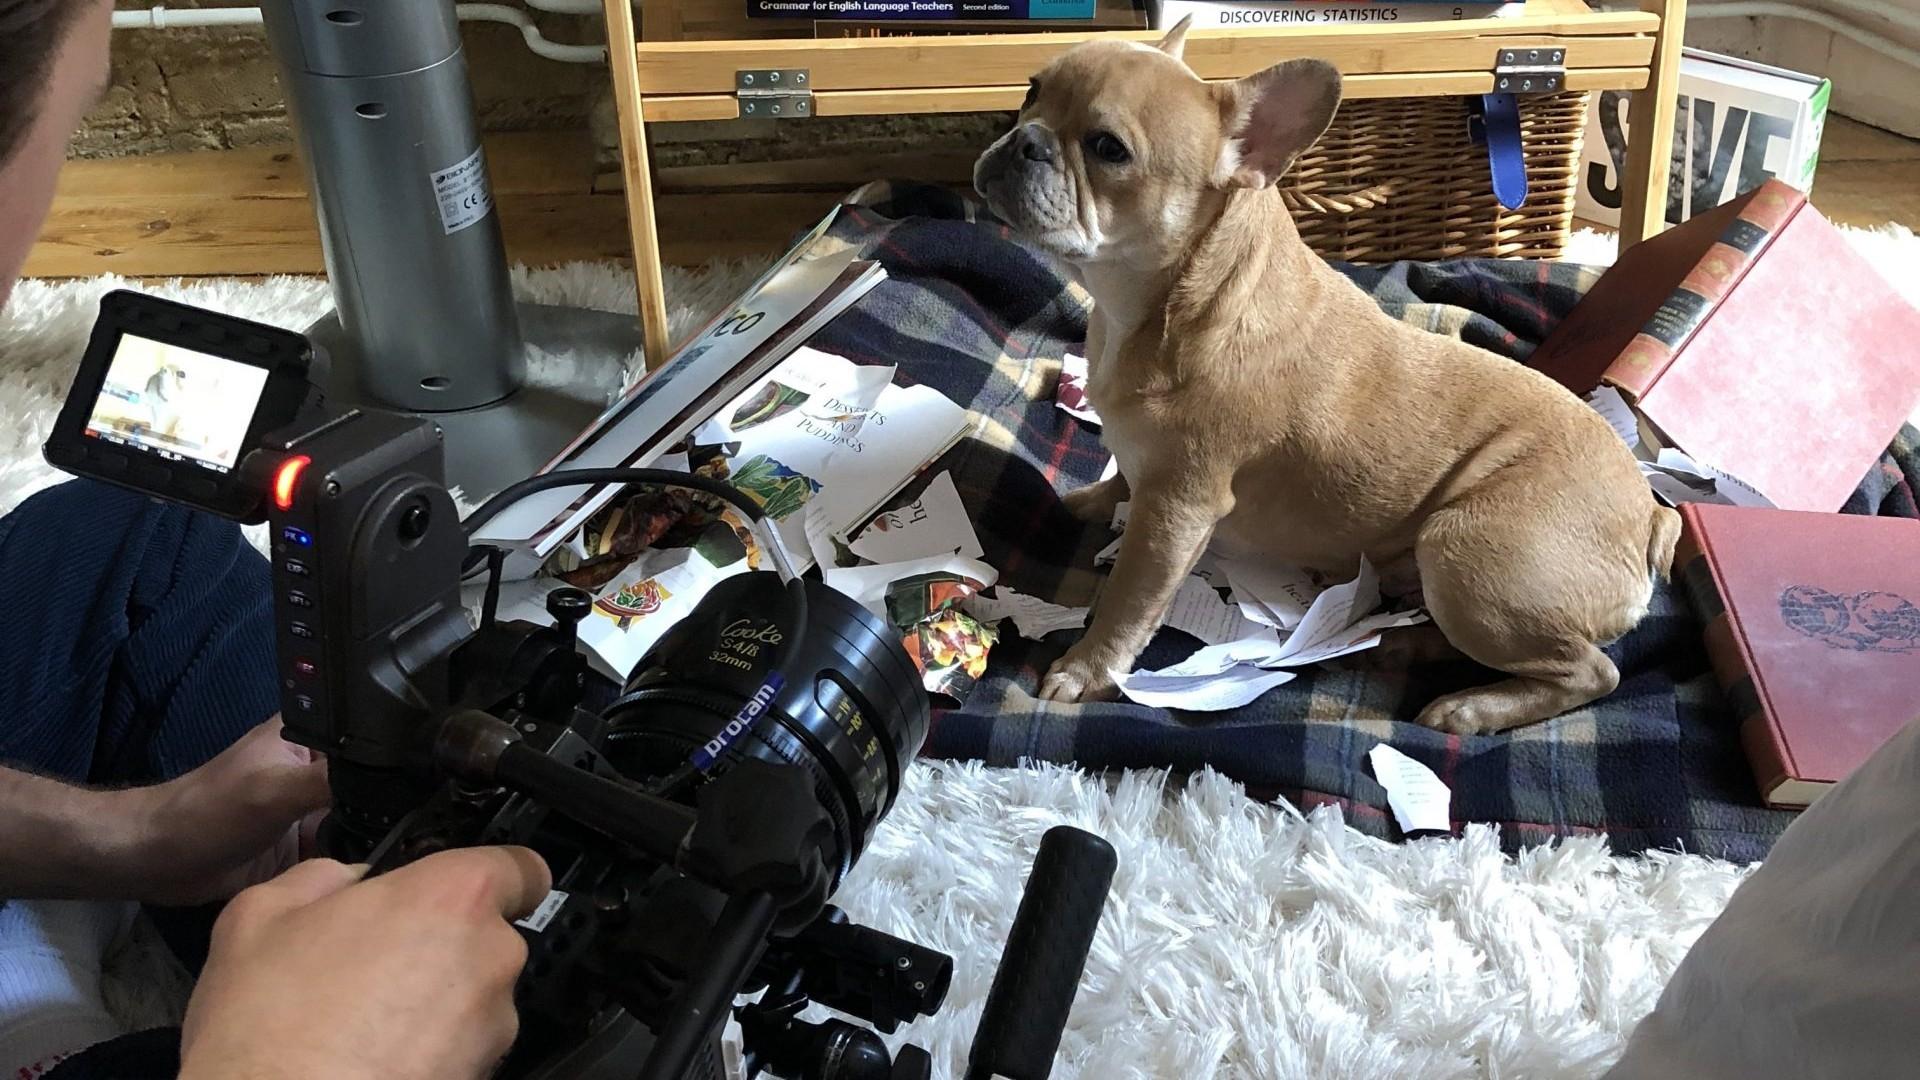 Habitual Media - Behind the scenes - dog